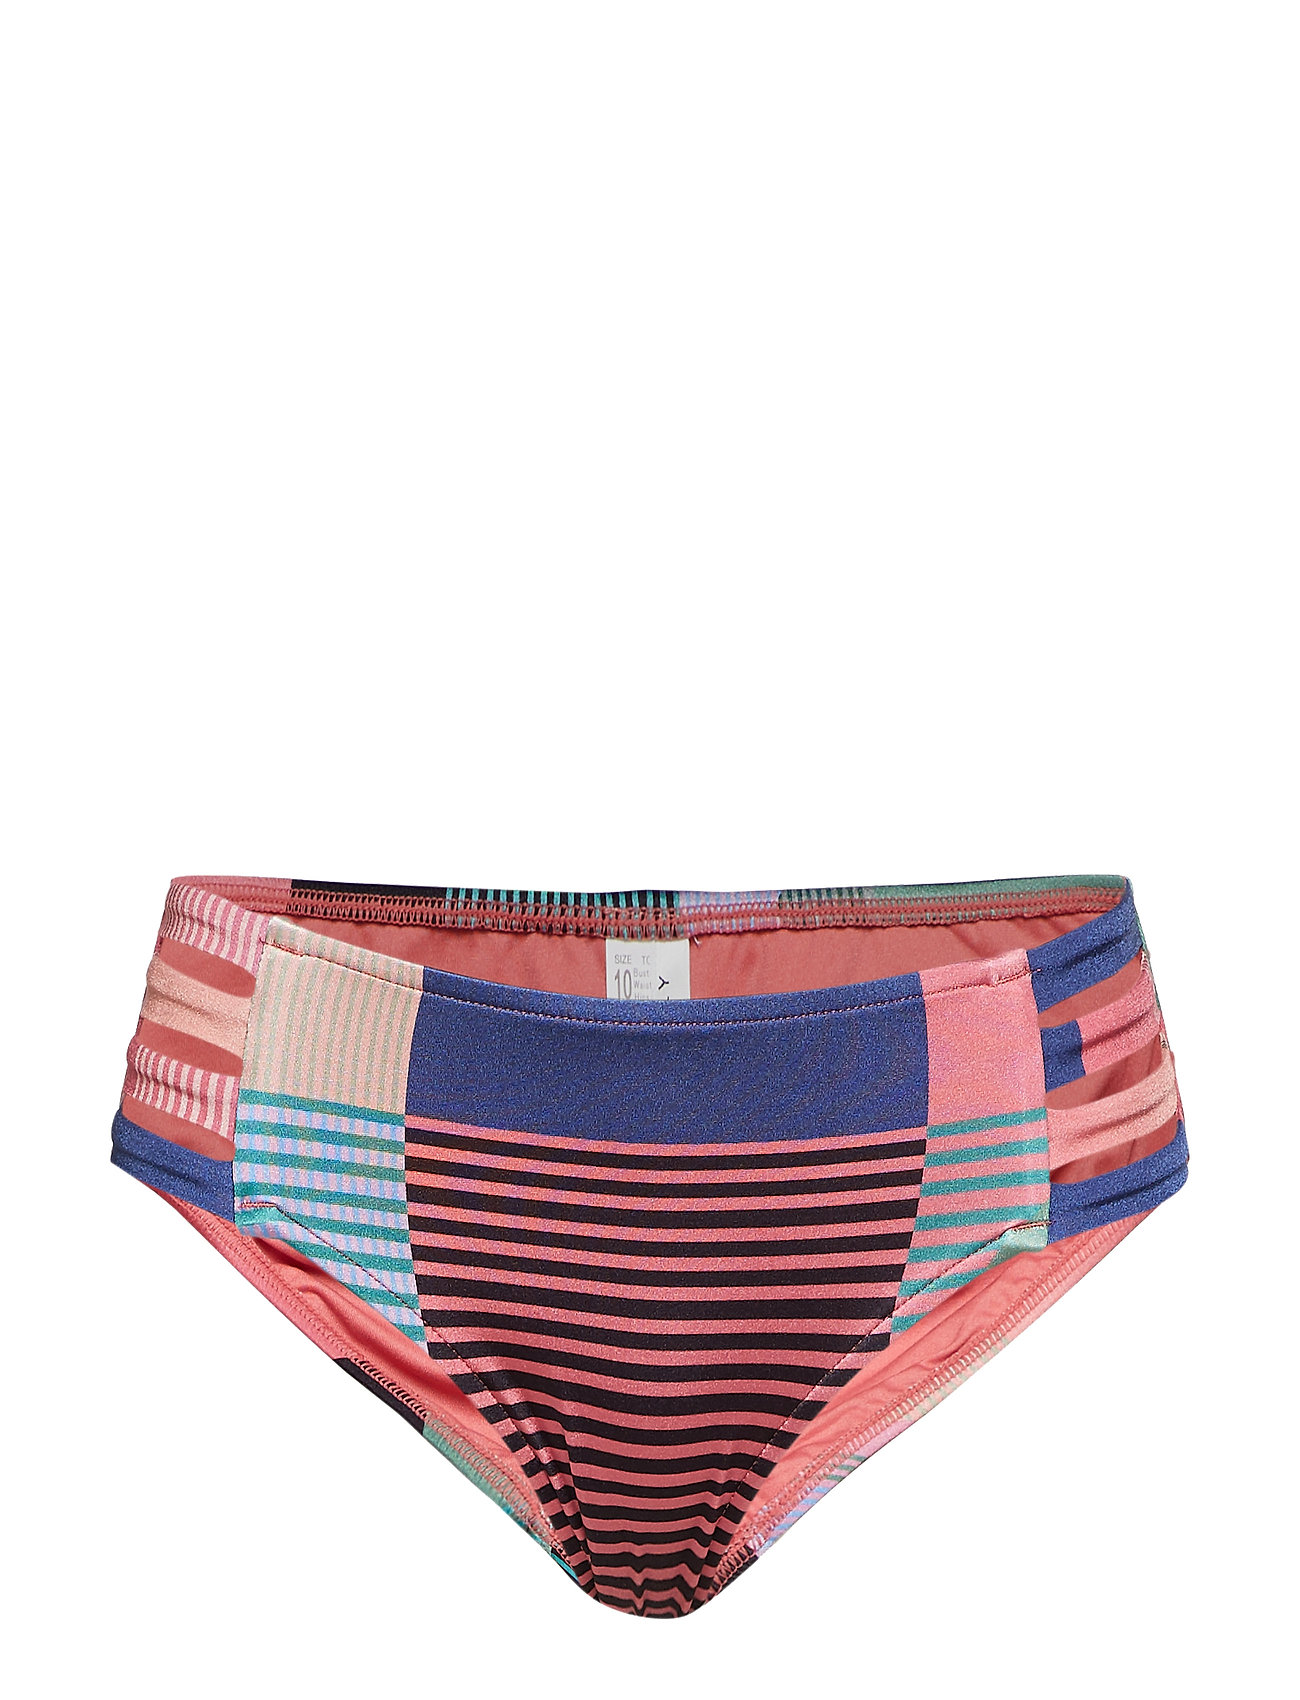 Image of Multi Strap Hipster Bikinitrusser Multi/mønstret SEAFOLLY (3174046863)